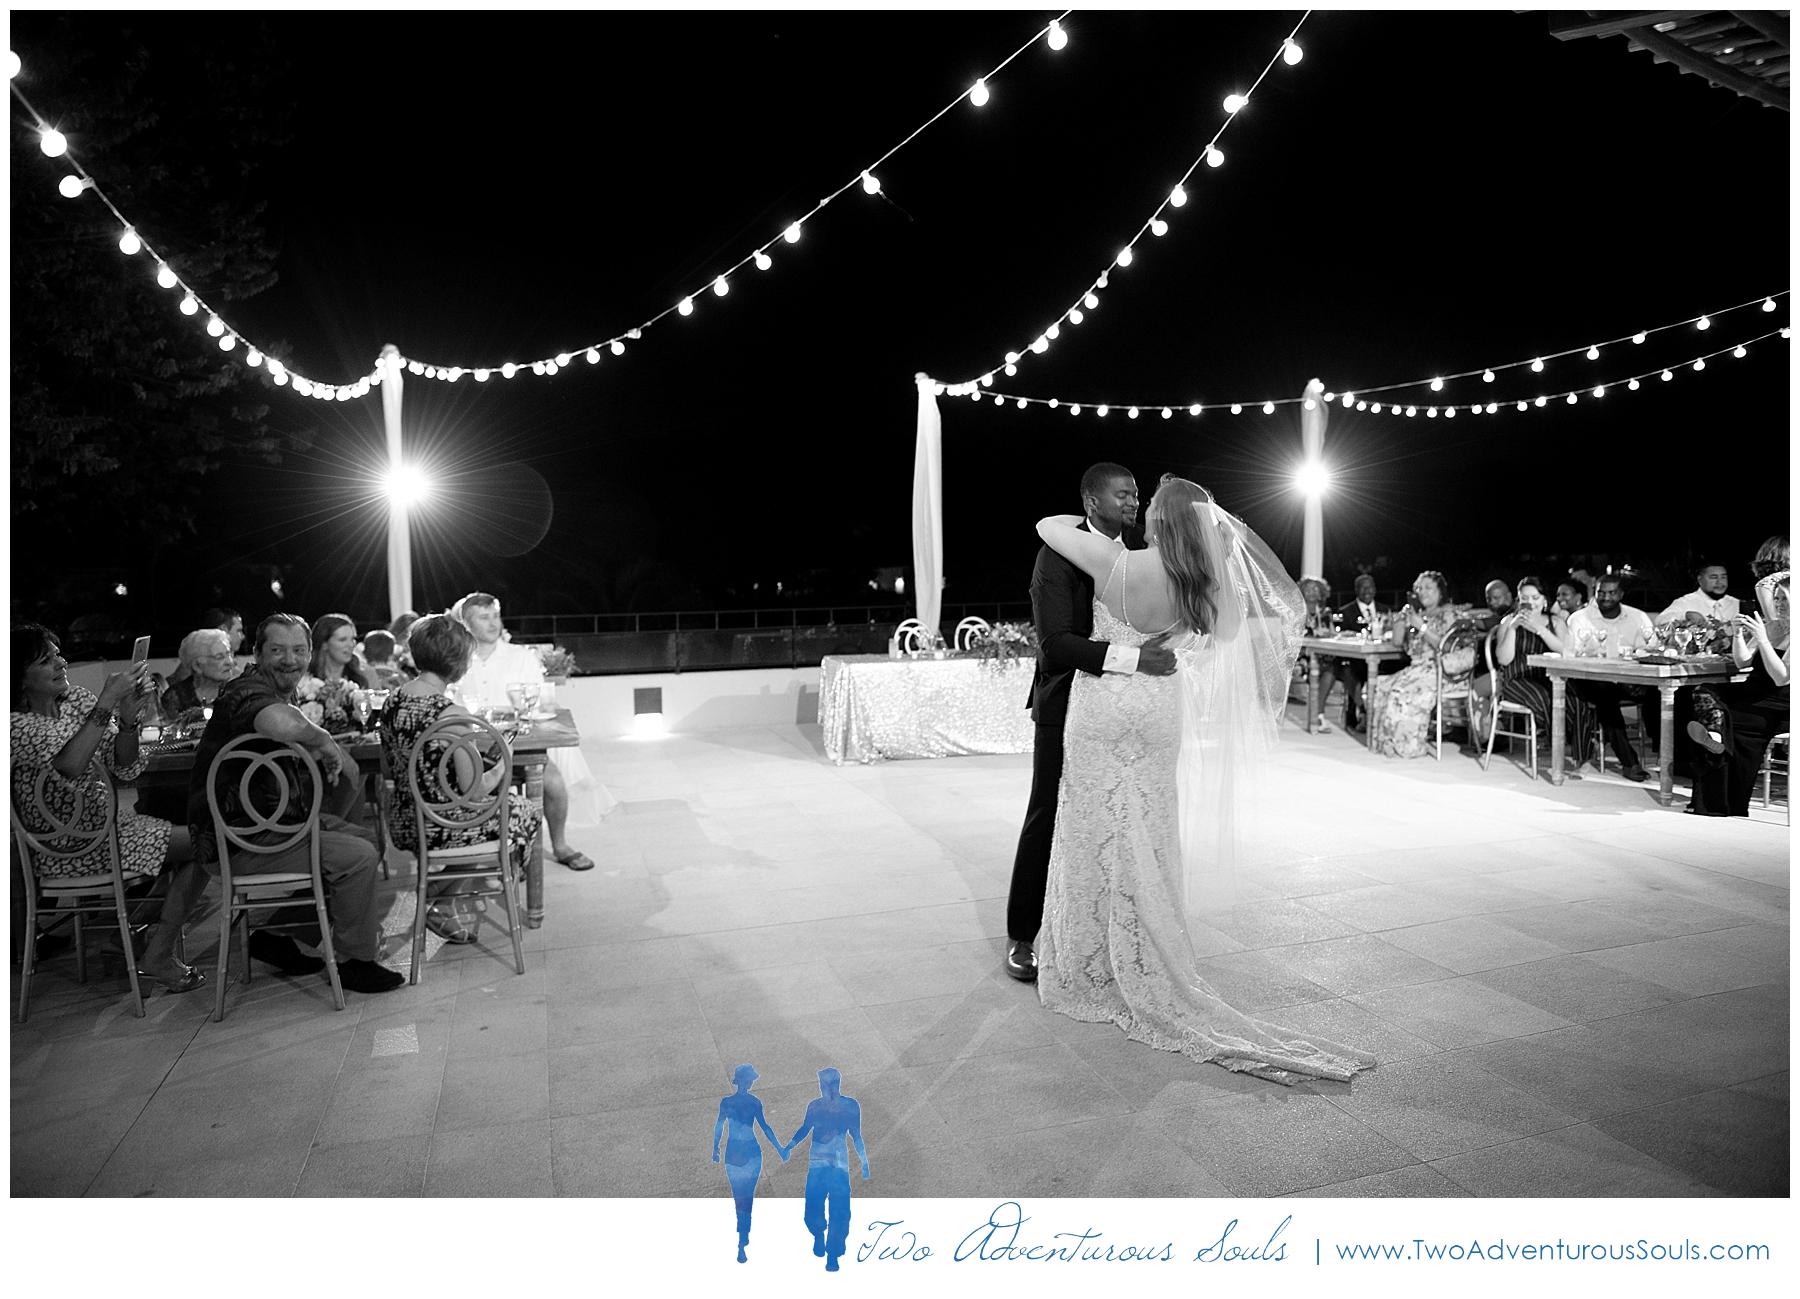 Costa Rica Wedding Photographers, Dreams las Mareas Wedding, Destination Wedding Photographers, Two Adventurous Souls - 022219_0041.jpg